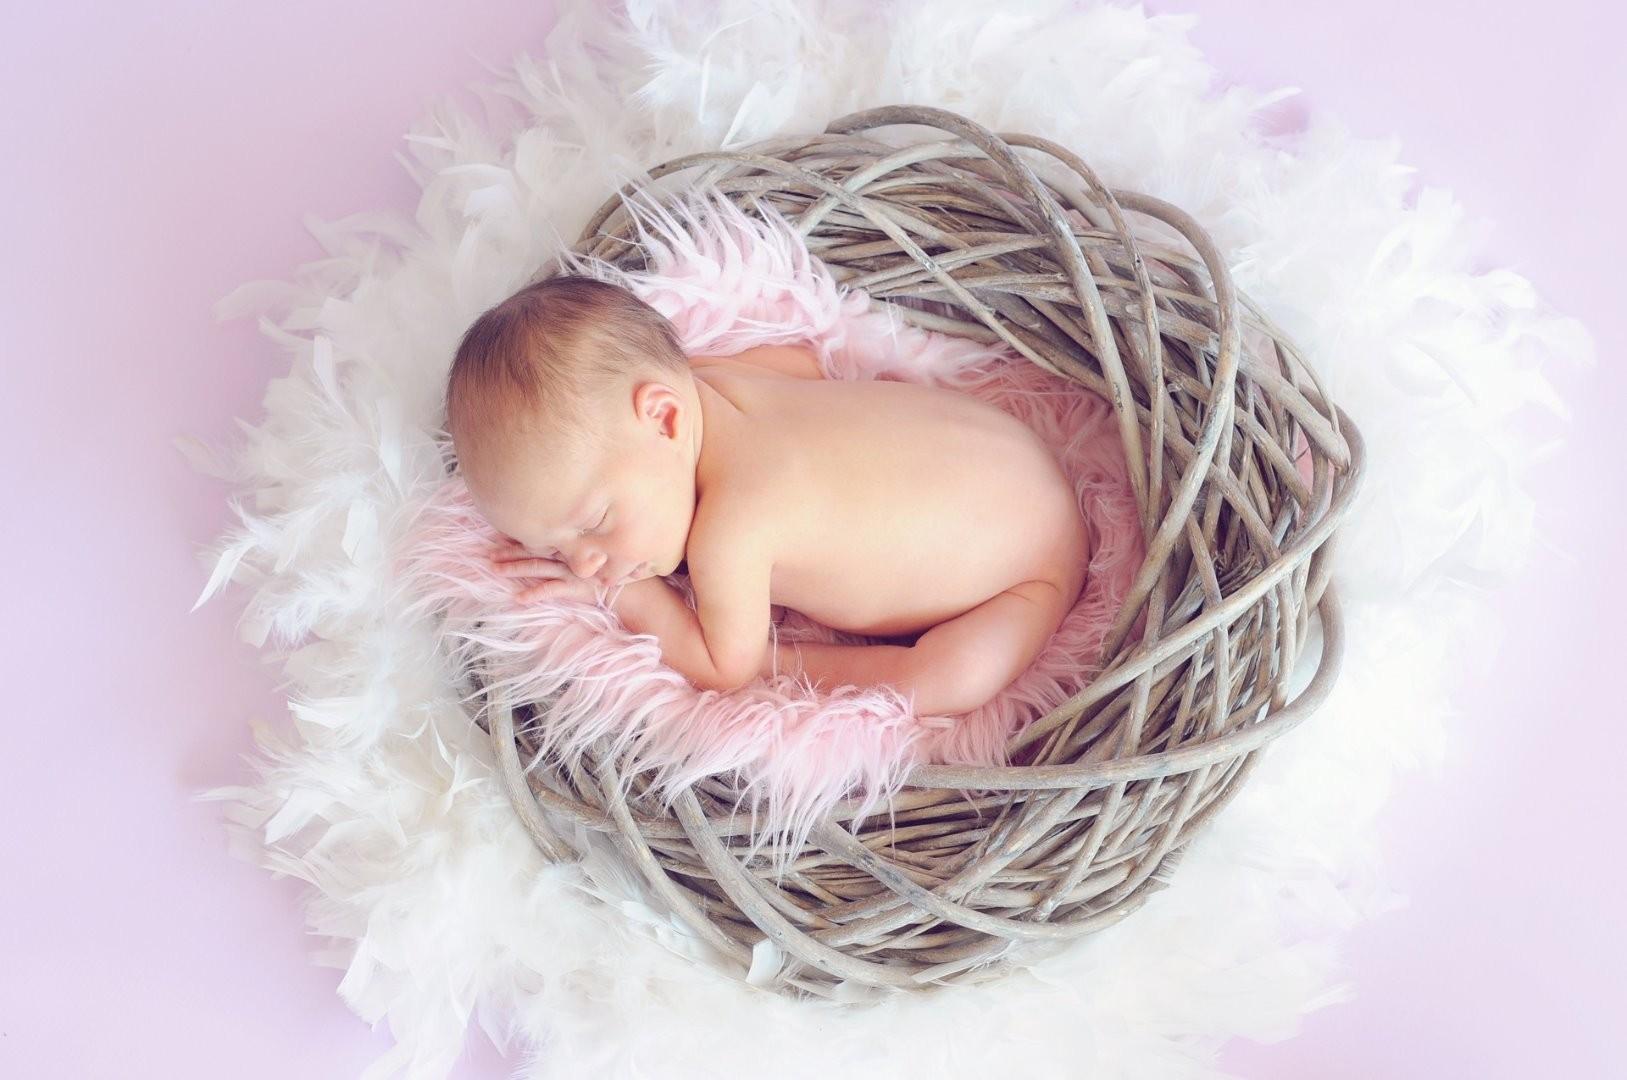 Baby_Pixabay.jpg